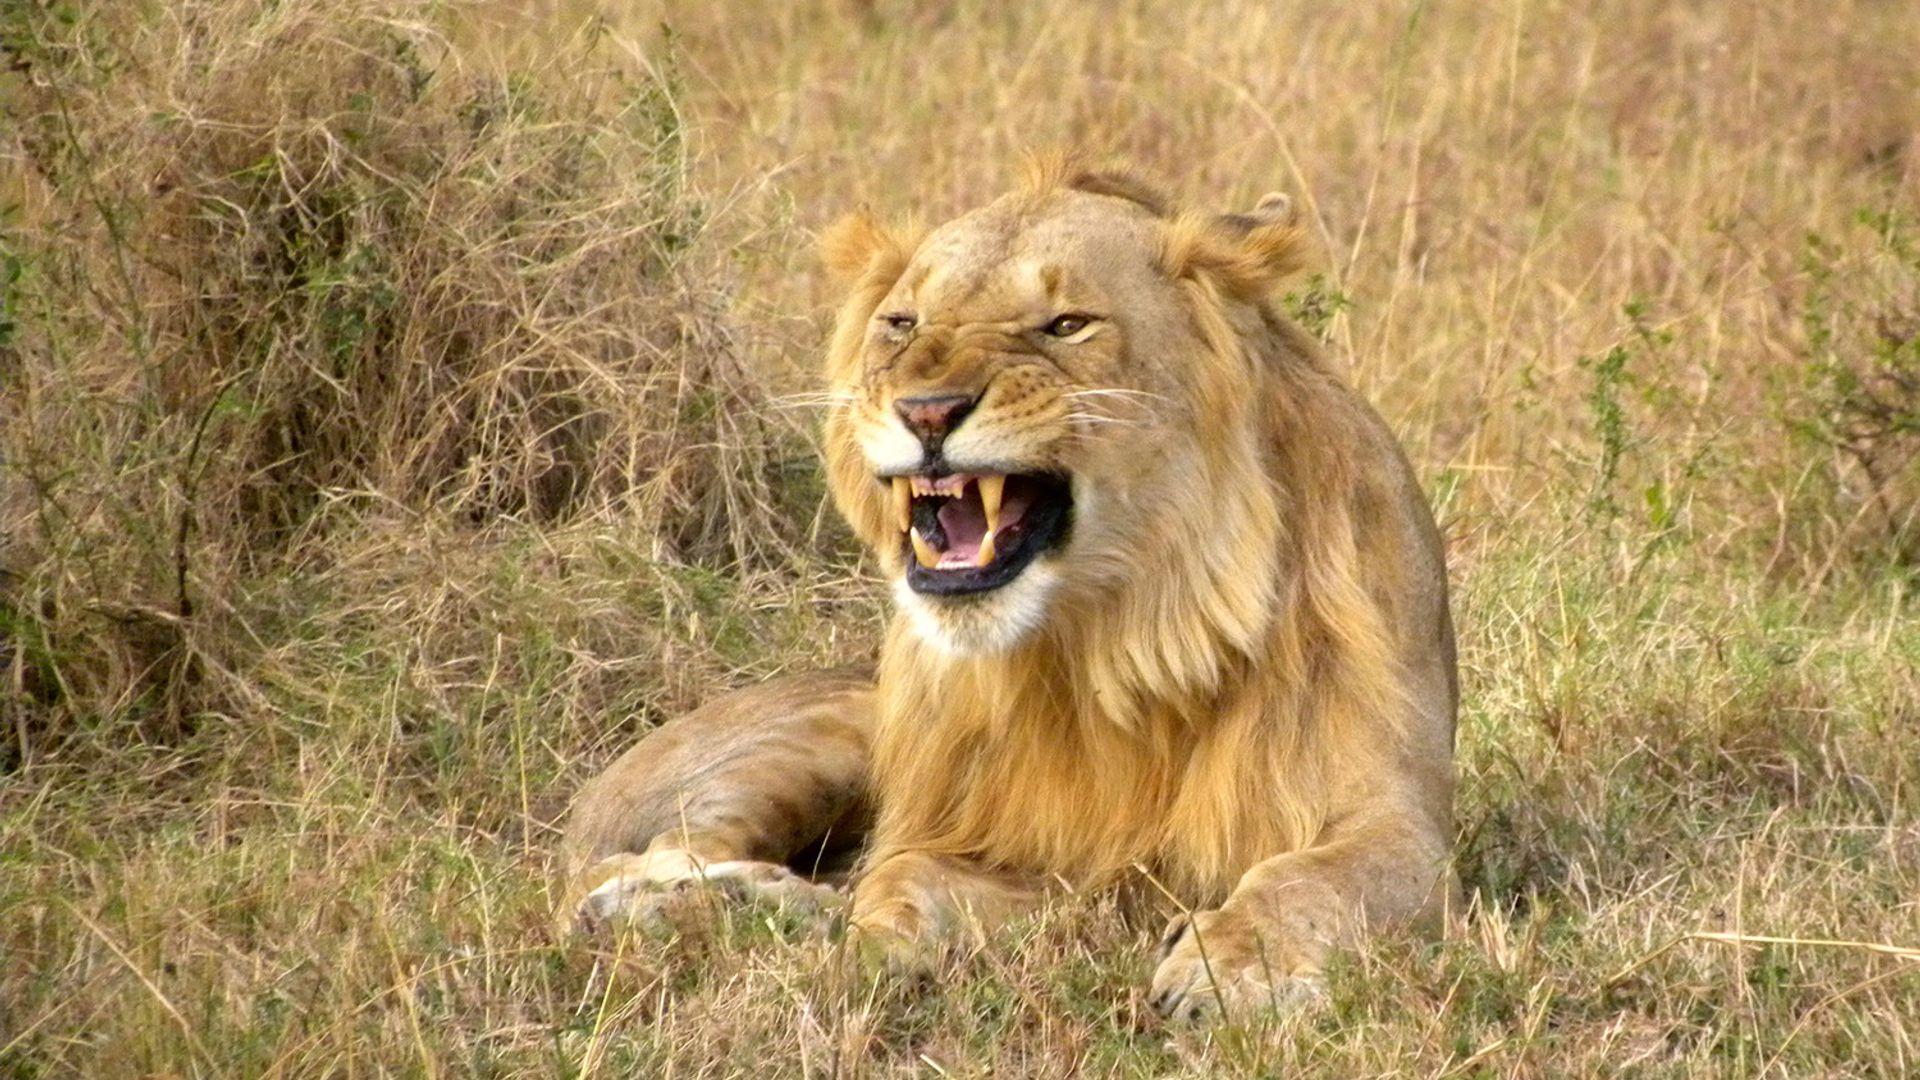 Circuit de grup - Essential Kenya, noiembrie 2021 - cu Yulicary Sarracent